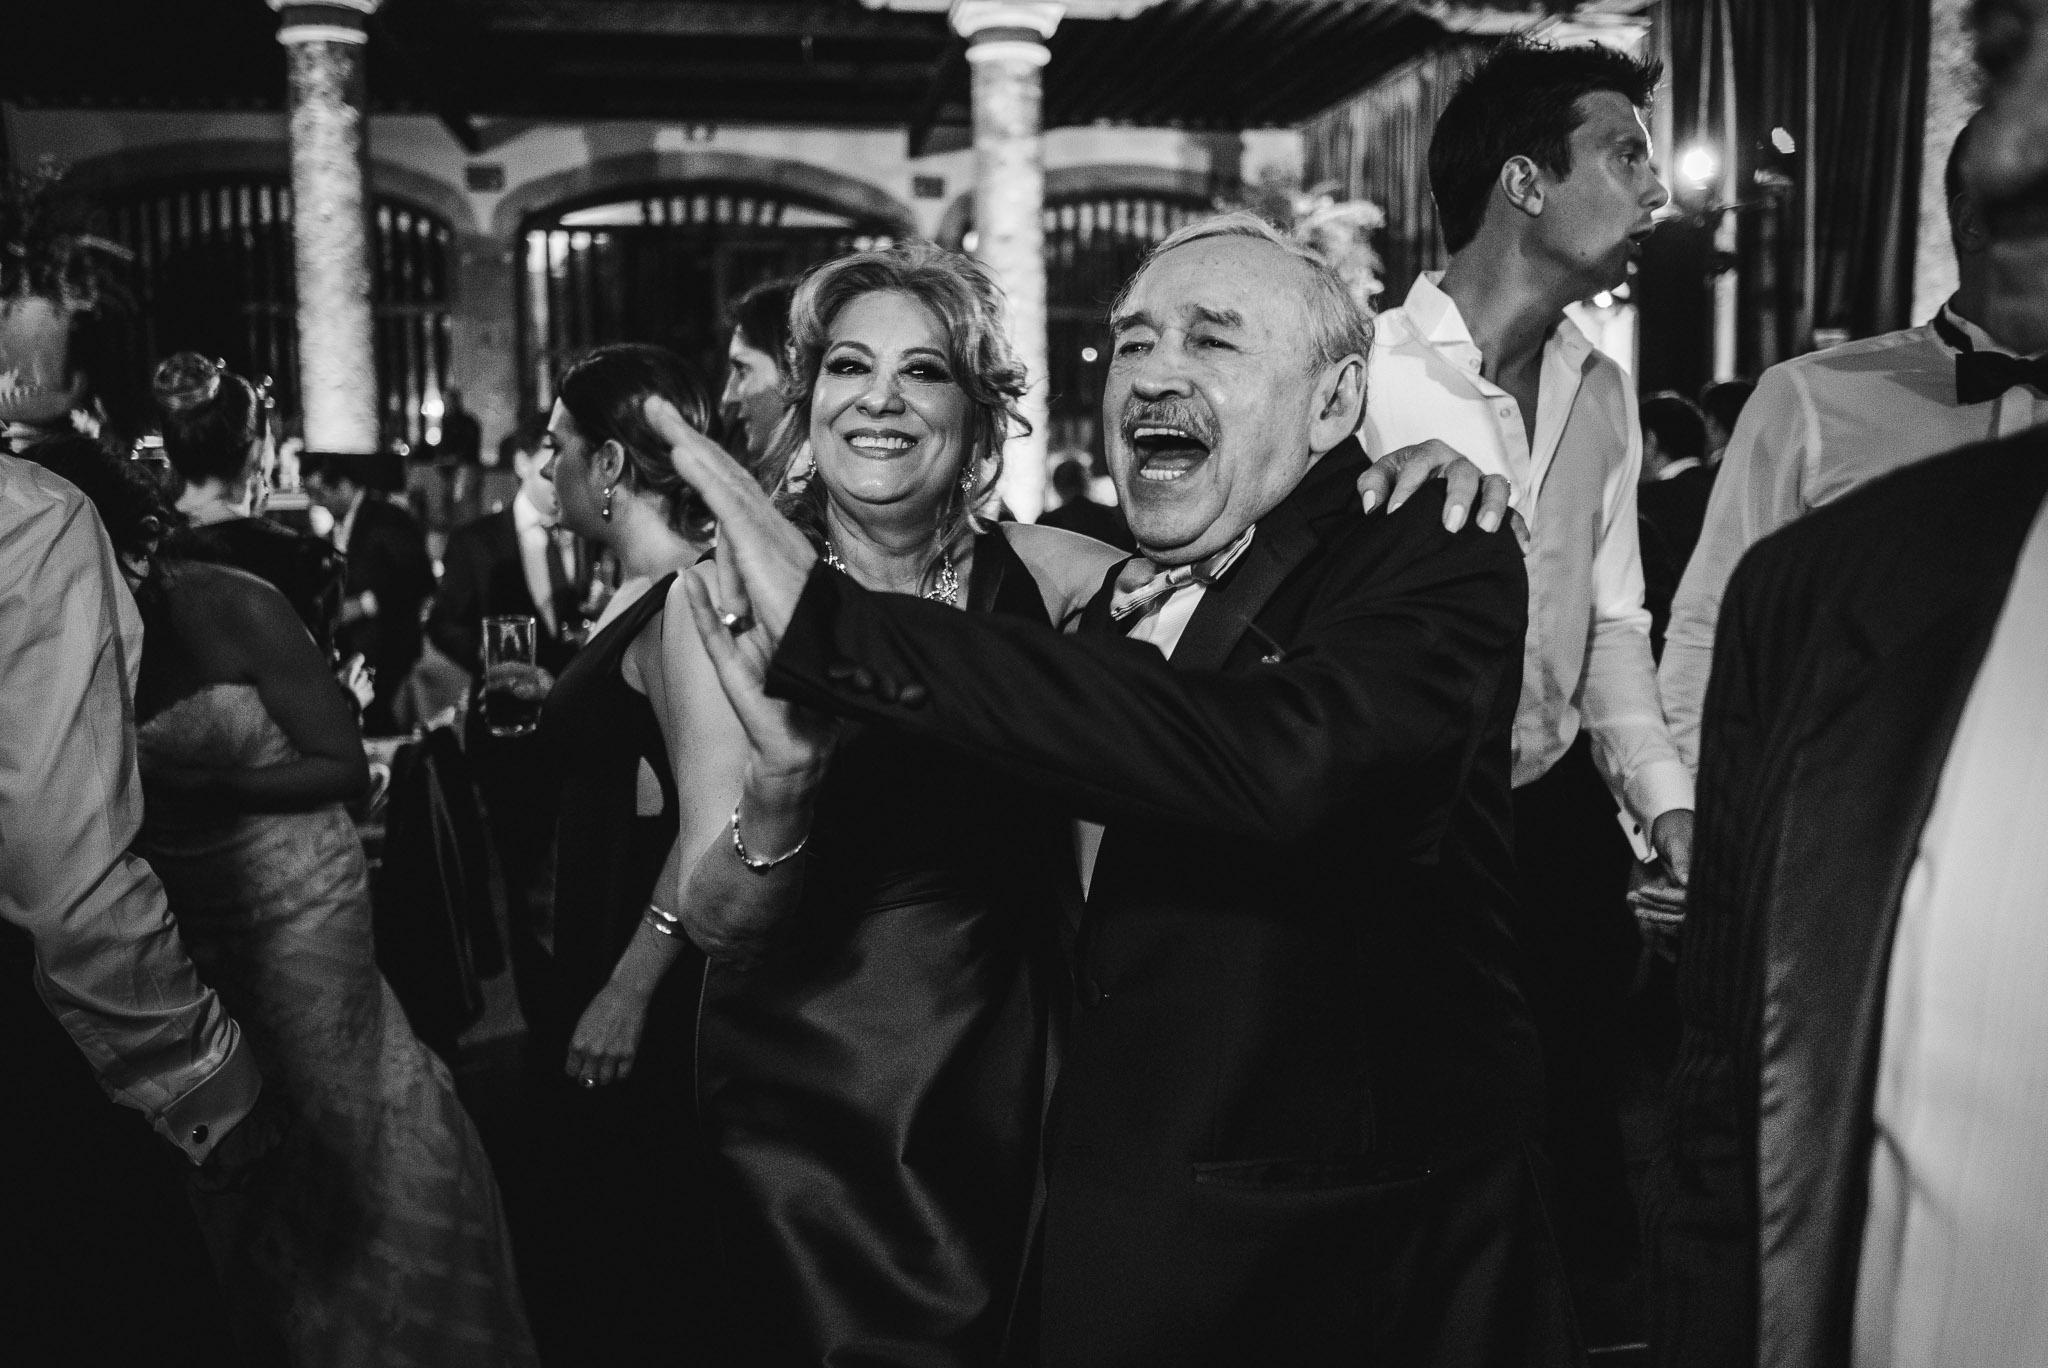 ©www.mauriziosolisbroca.com-20161002maurizio-solis-broca-mexico-canada-wedding-photographer20161002DSC09387-Edit.jpg